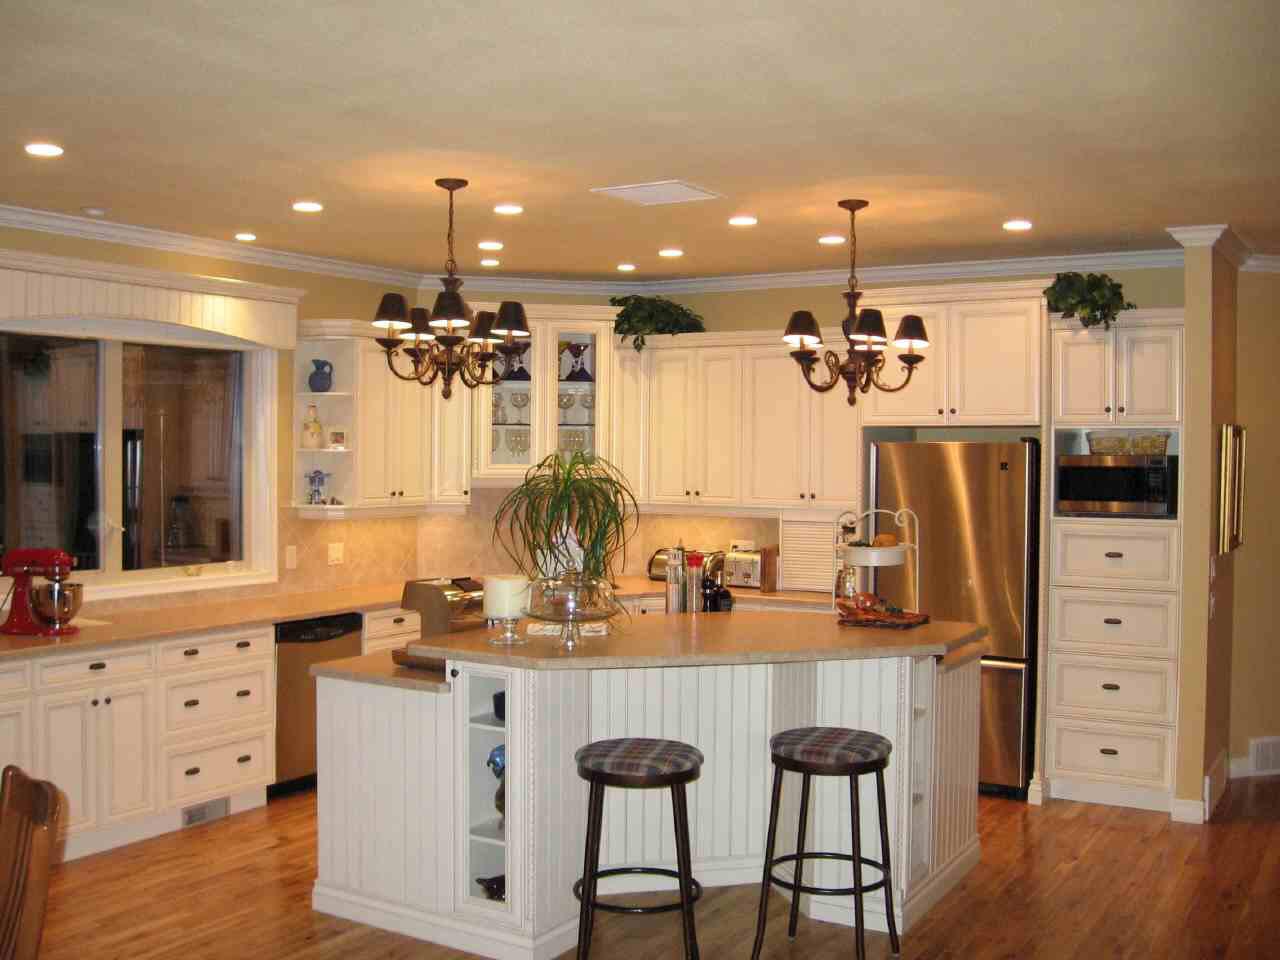 Contemporary kitchen counter stools Photo - 2